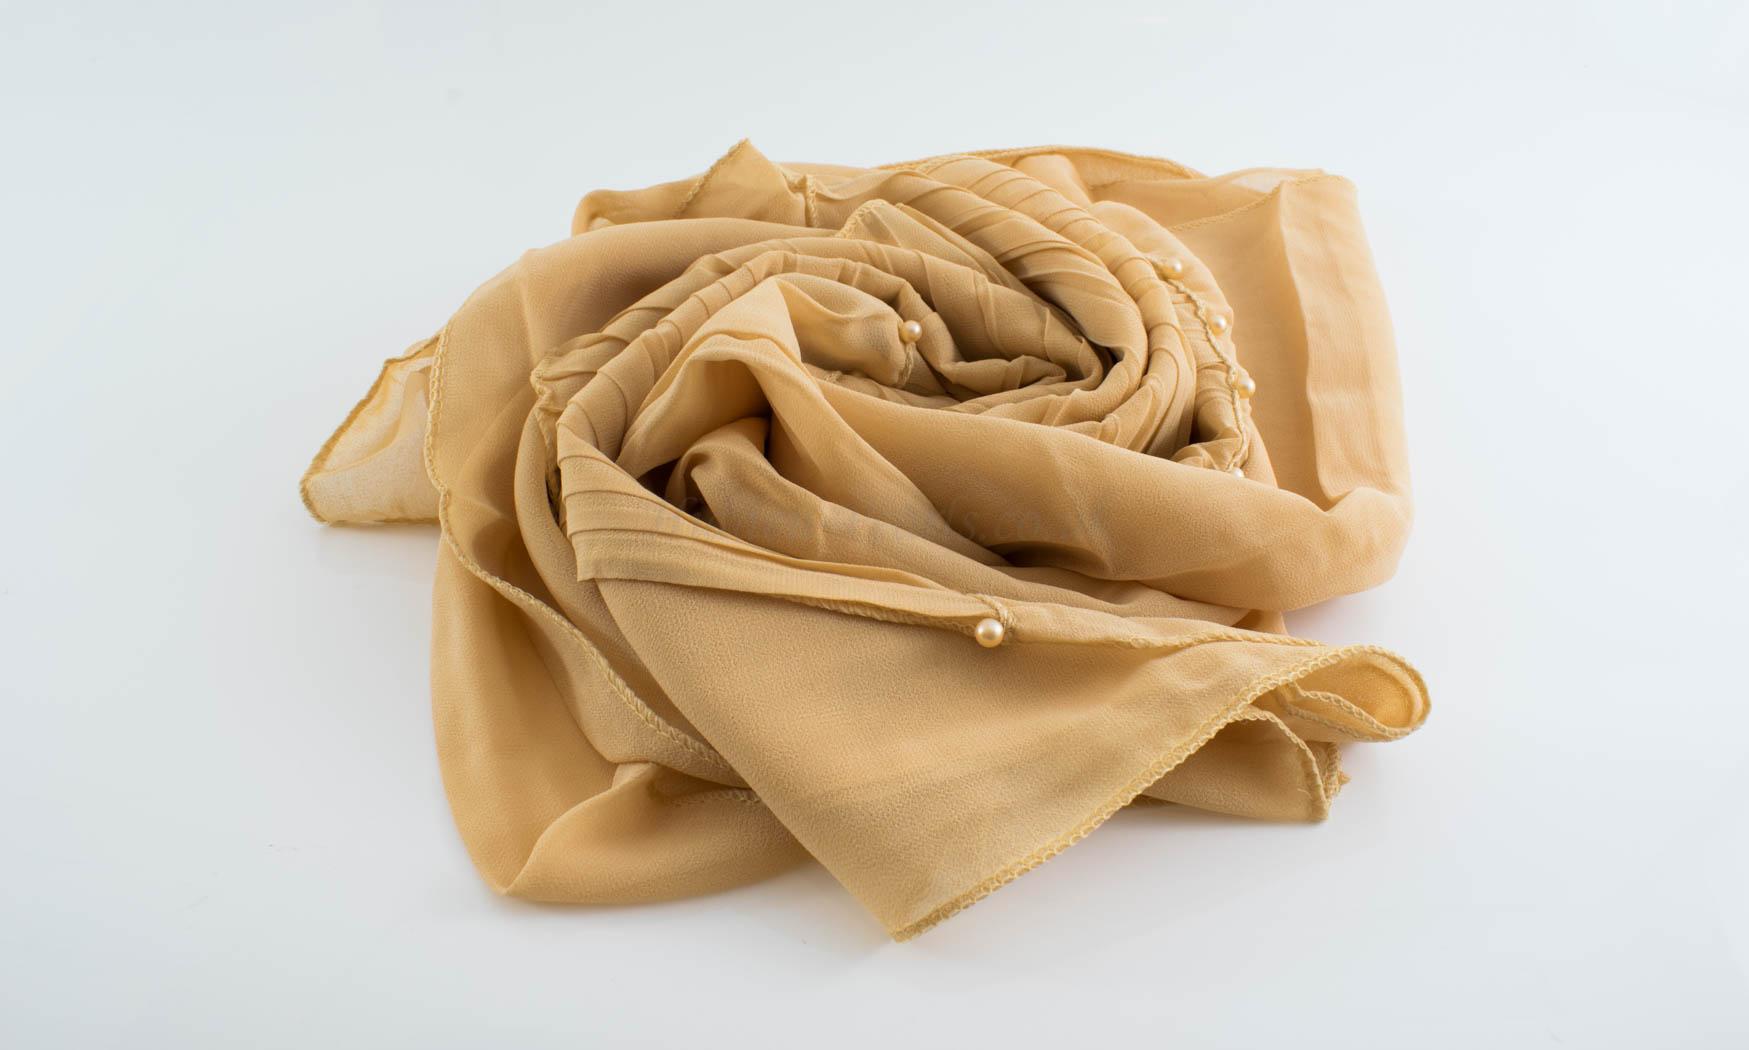 One Side Pleated Chiffon Hijab - Hidden Pearls - Golden Beige